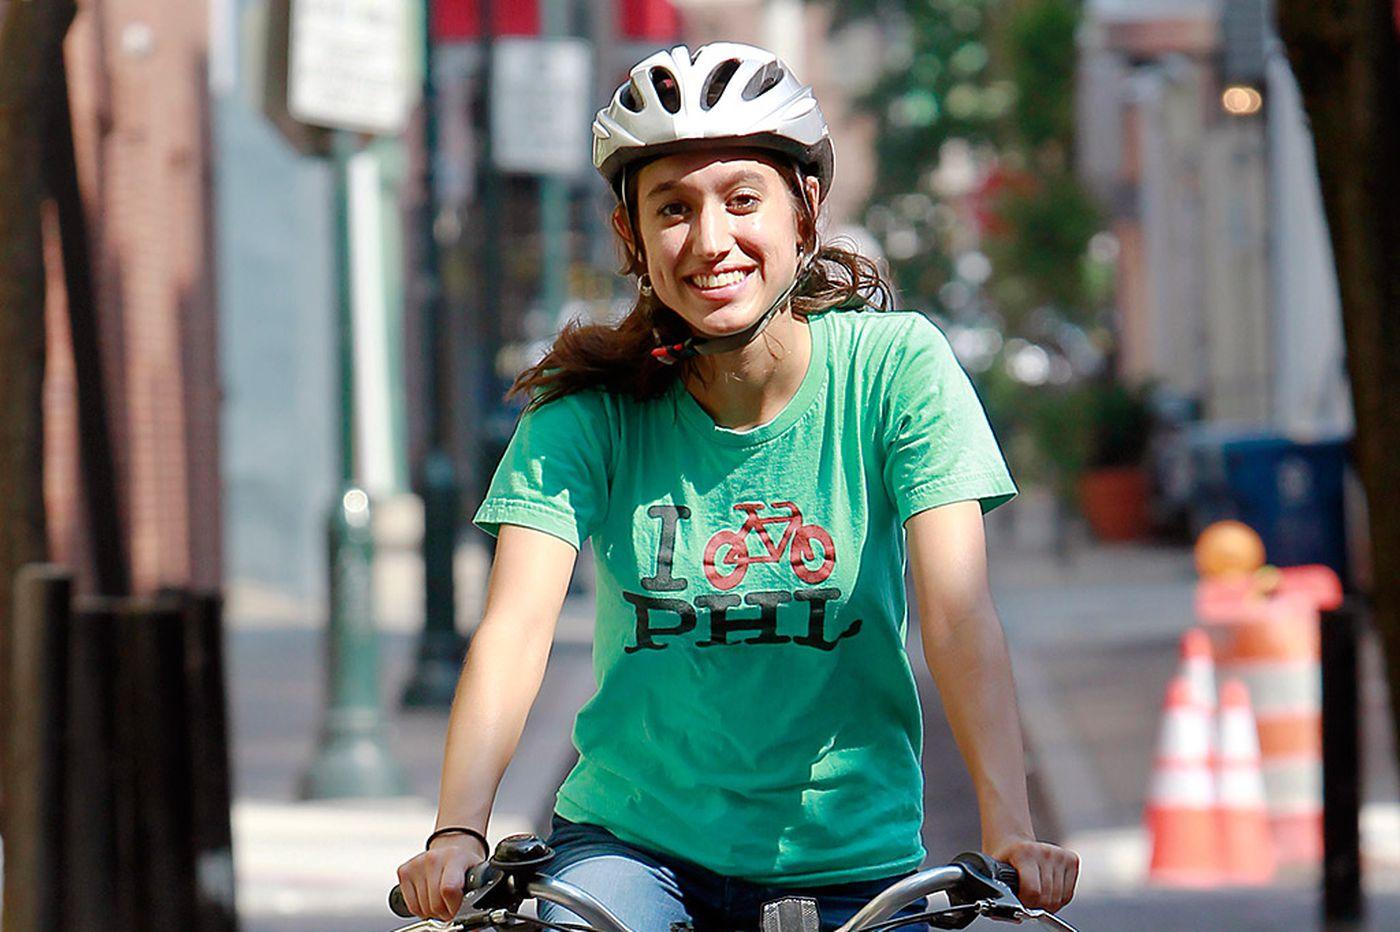 Fewer women than men ride bikes in Phila.